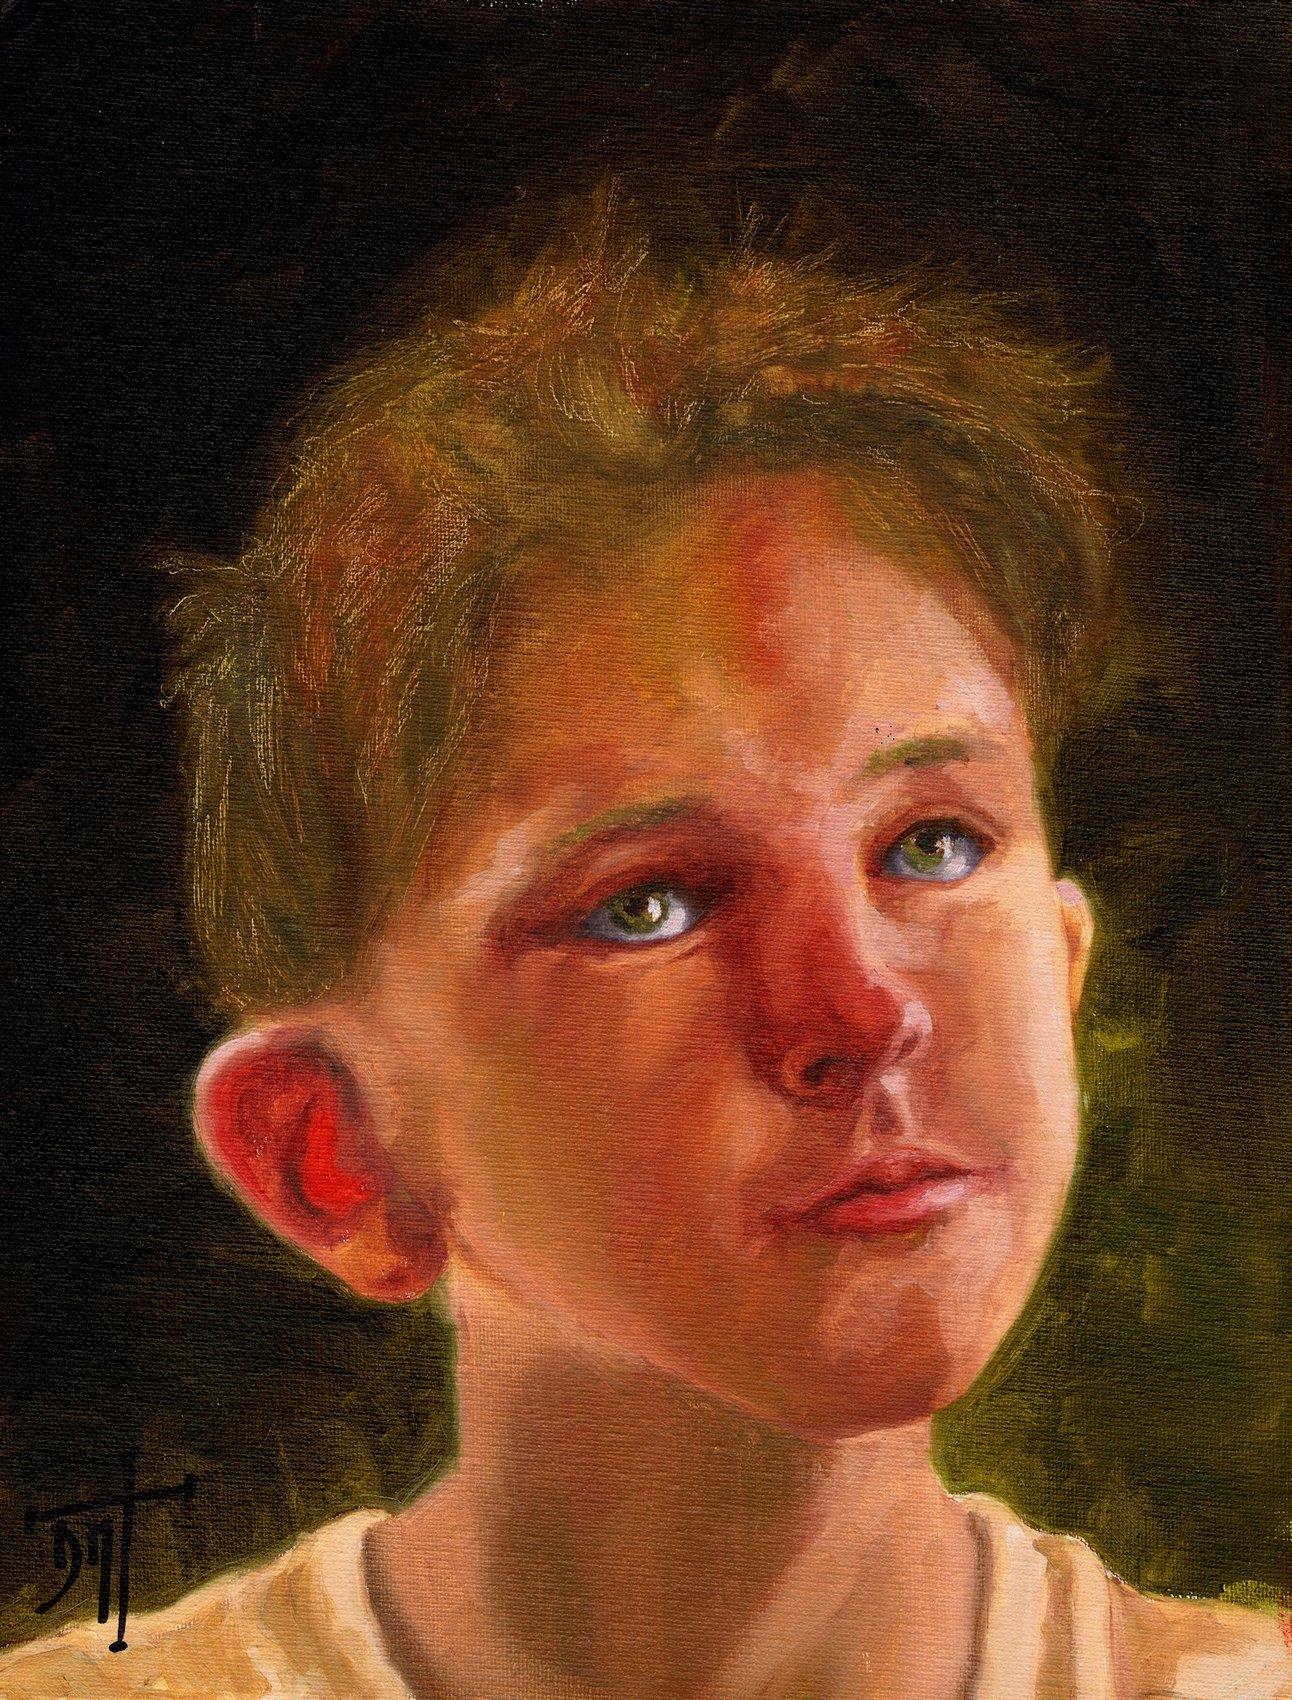 Study child portrait By EmiliO N°129